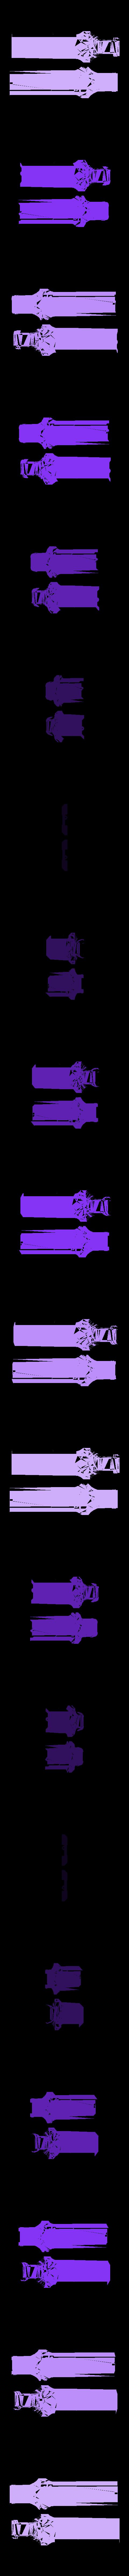 MS-HandleBlade.stl Download free STL file LED Zelda Master • 3D printable template, Adafruit